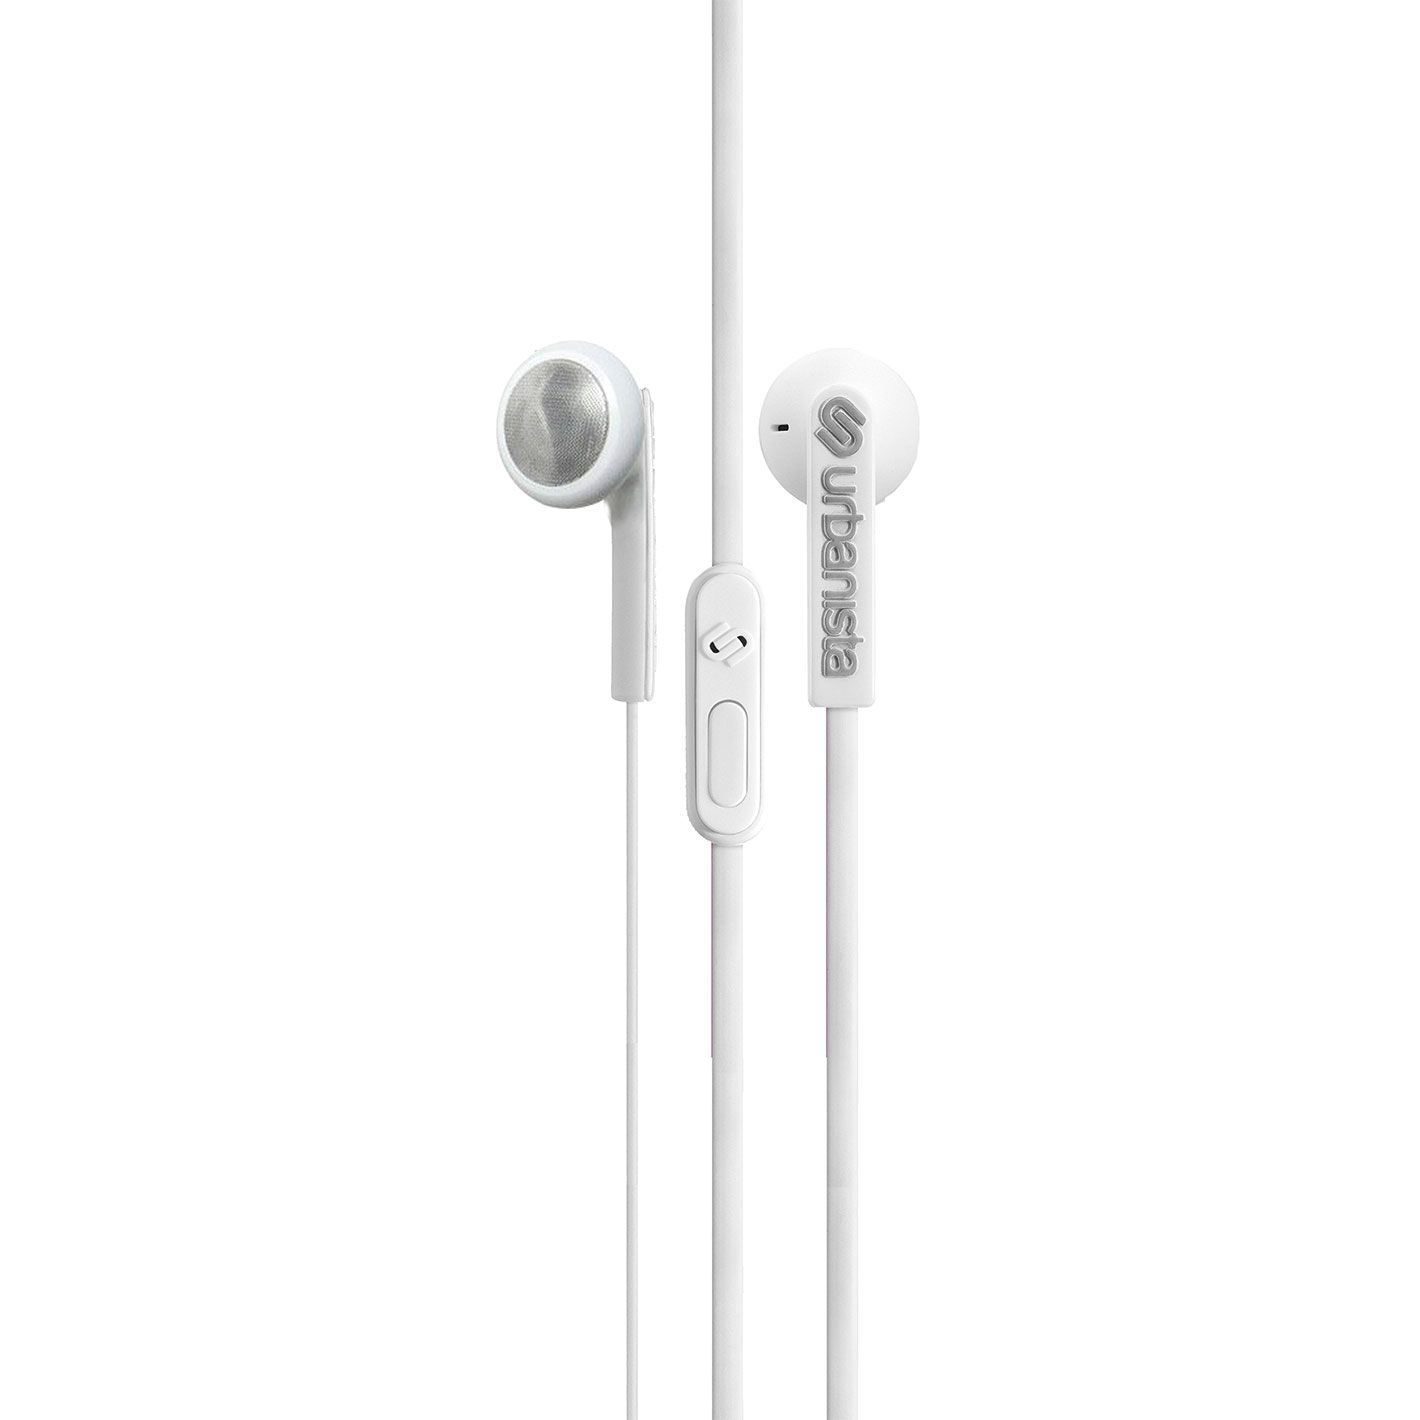 Urbanista Osla Earphone|Music|Call|Fit iOS Android Windows|Fluffy Cloud - White